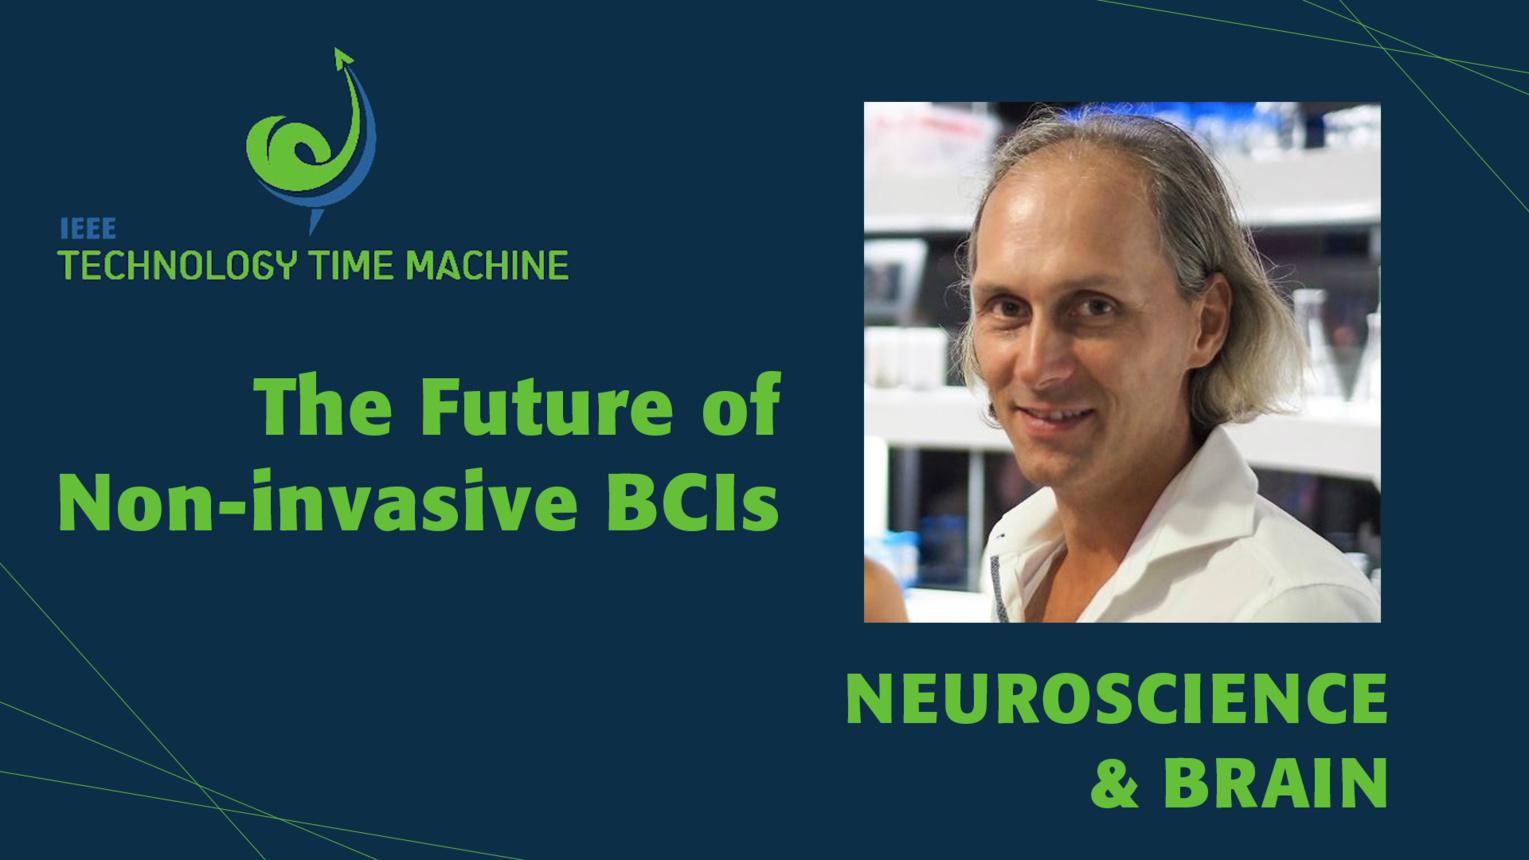 Christoph Guger: Neuroscience & Brain Panel - The Future of Non-invasive Brain-computer Interfaces - TTM 2018